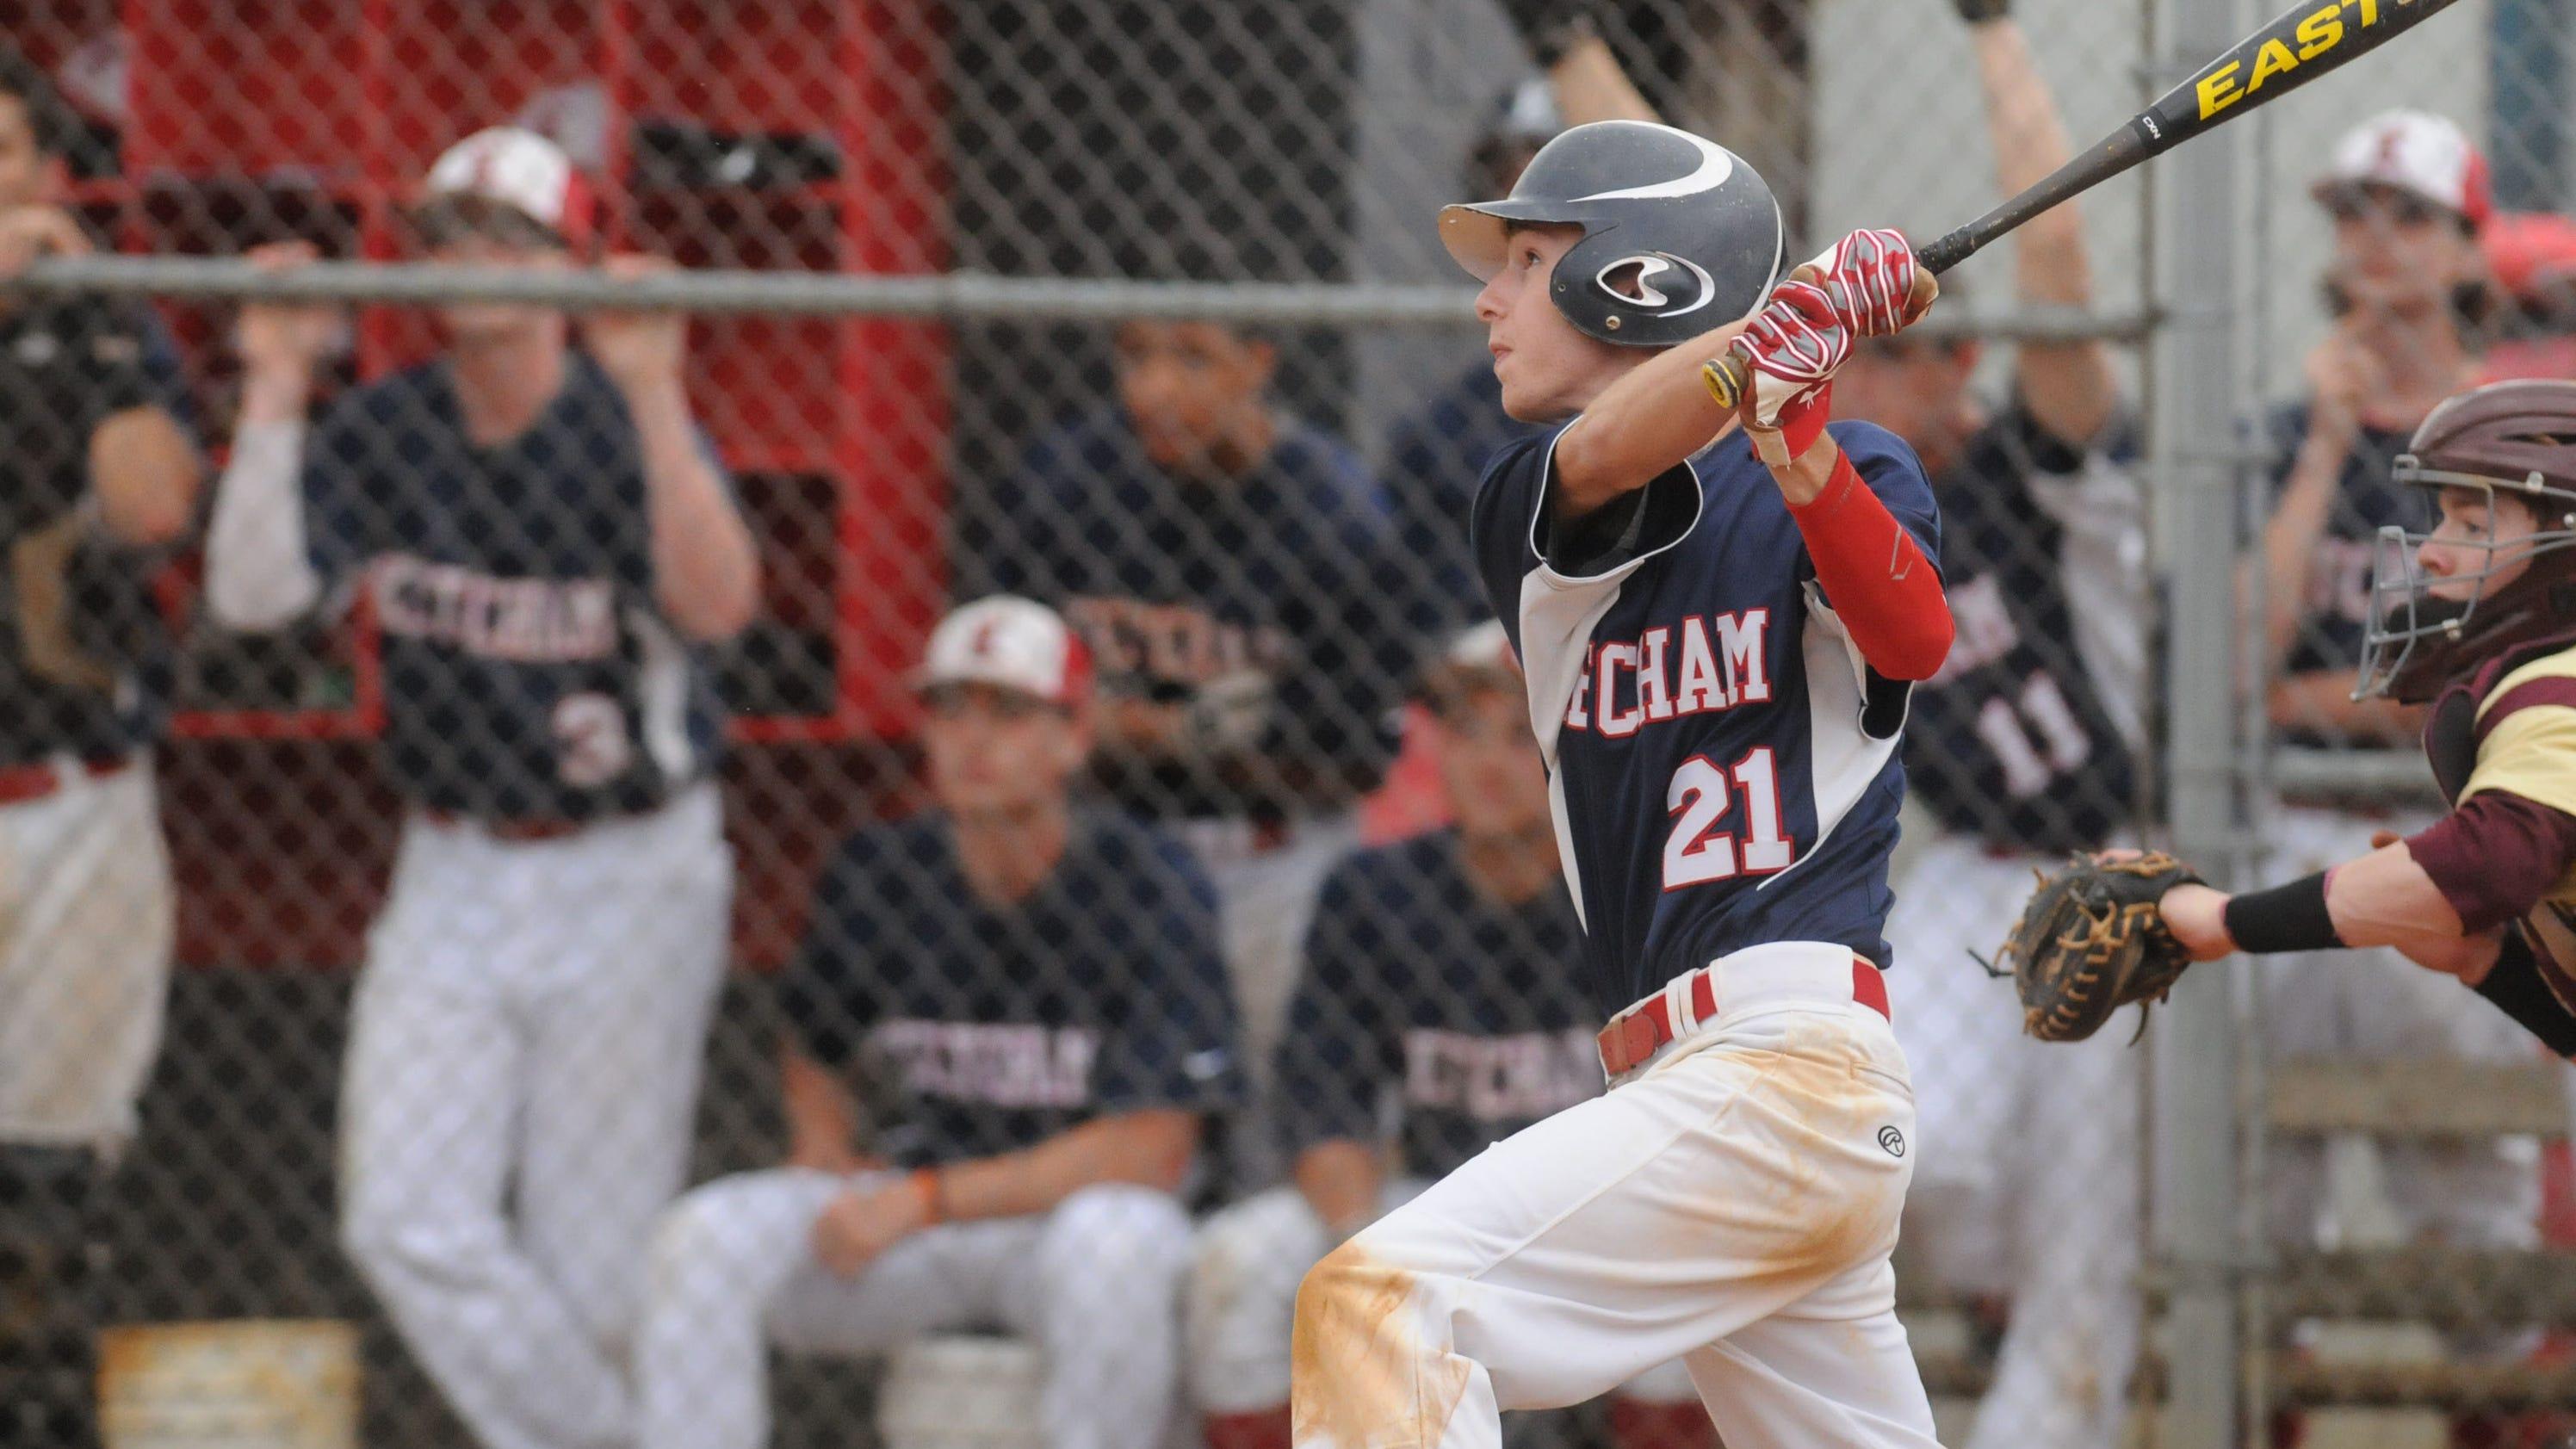 Baseball: Seidner's walk-off hit lifts Ketcham